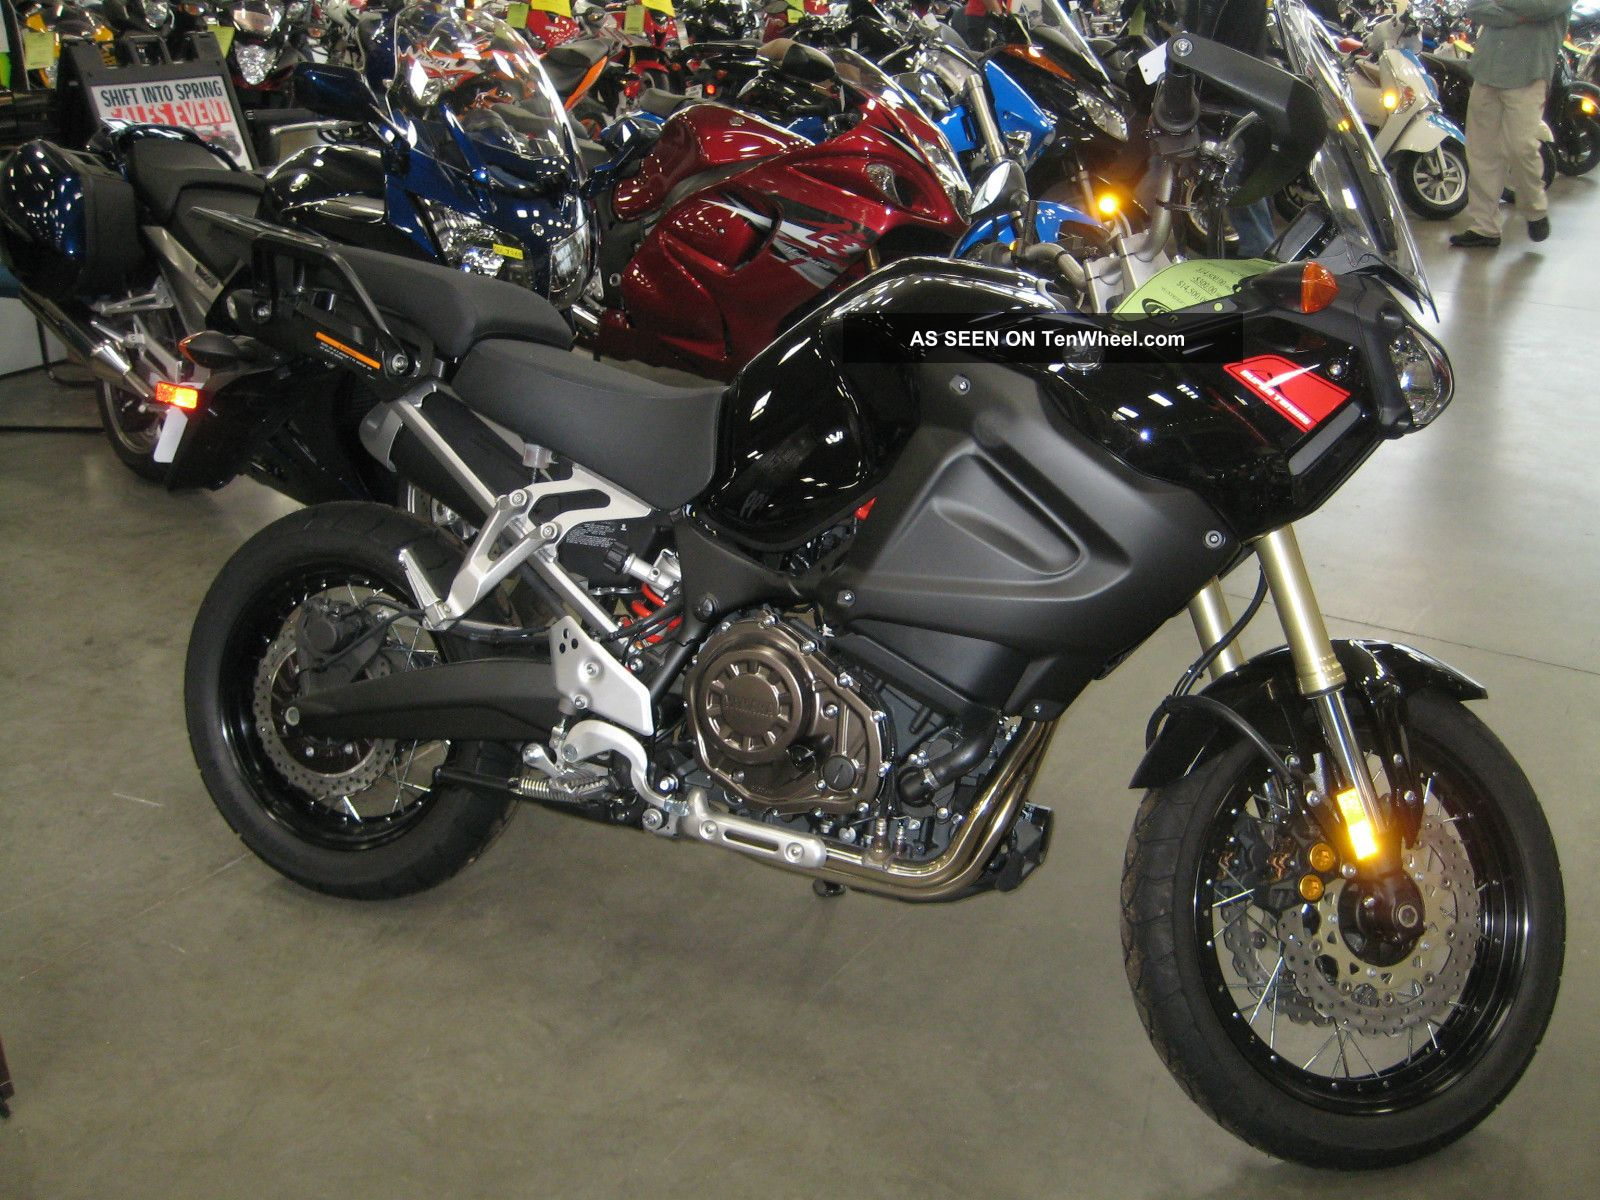 2012 Yamaha Tenere Adventure Motorcycle Dual Purpose Bike Cruiser Xtz Other photo